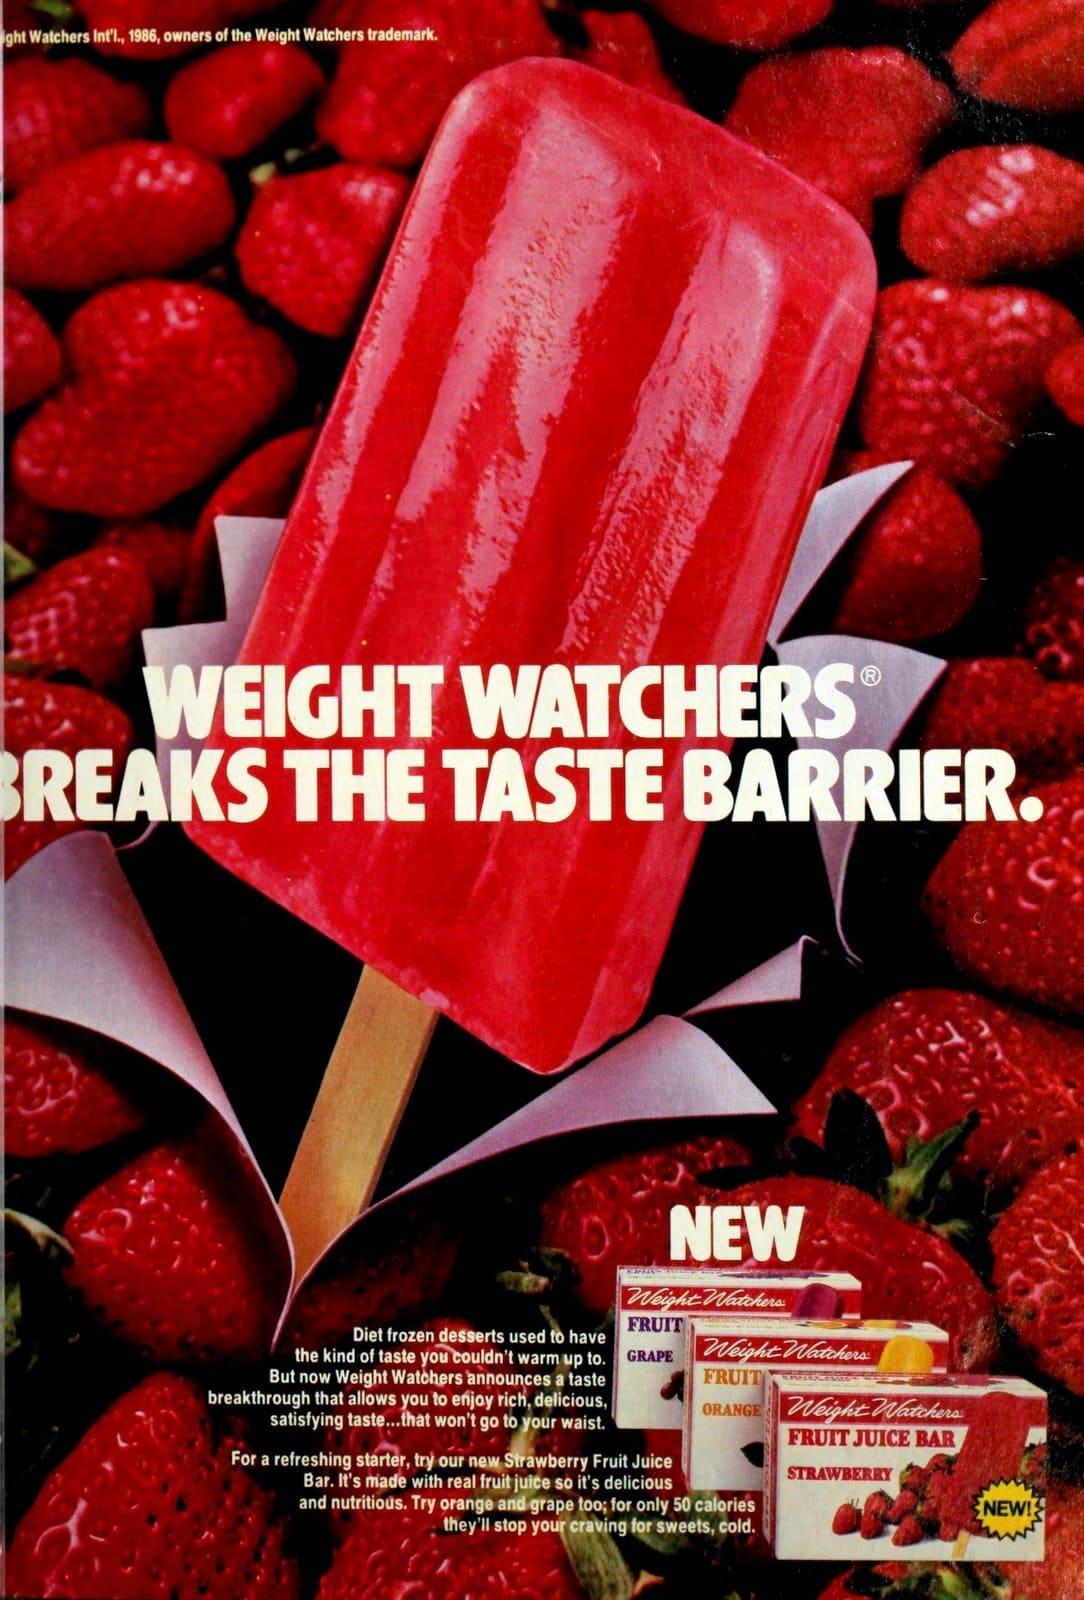 Weight Watchers strawberry juice pops (1986)